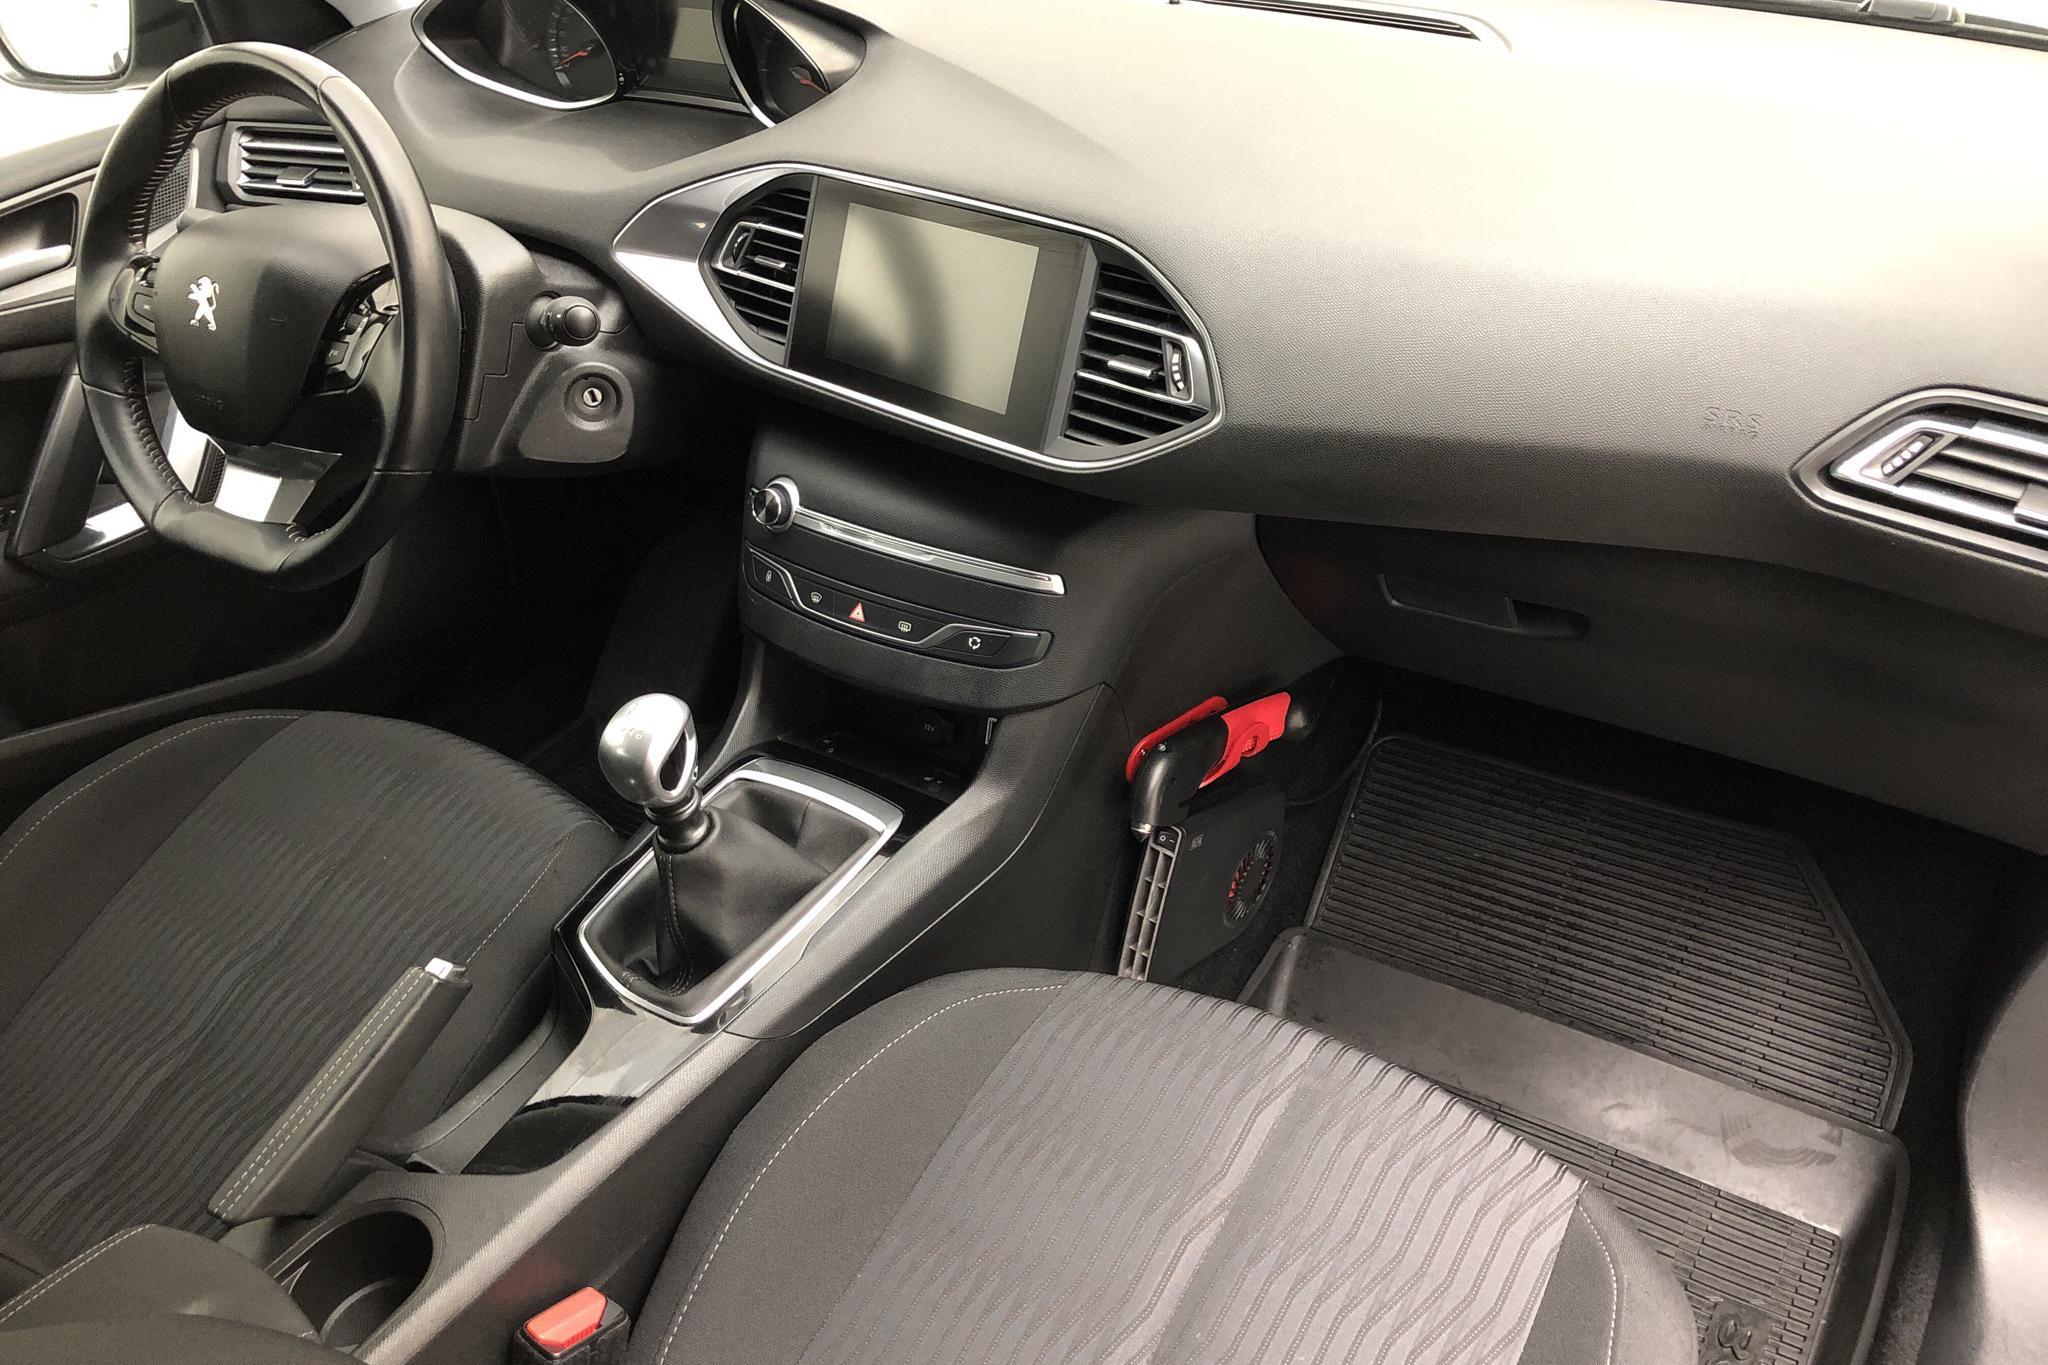 Peugeot 308 SW BlueHDi (120hk) - 1 148 mil - Manuell - Light Grey - 2017